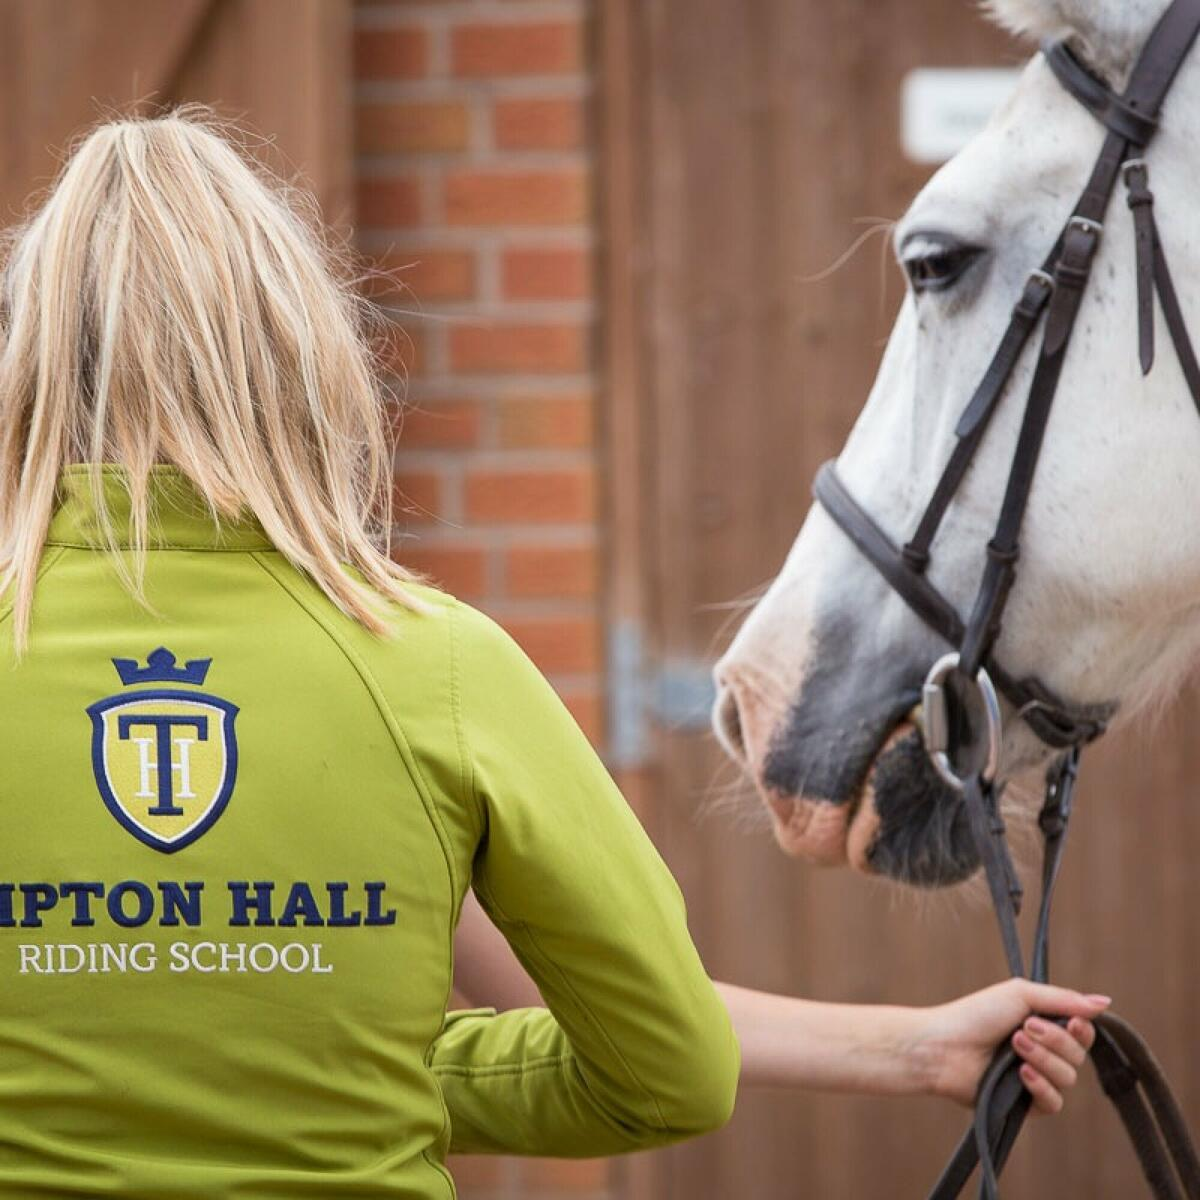 Tipton Hall riding School